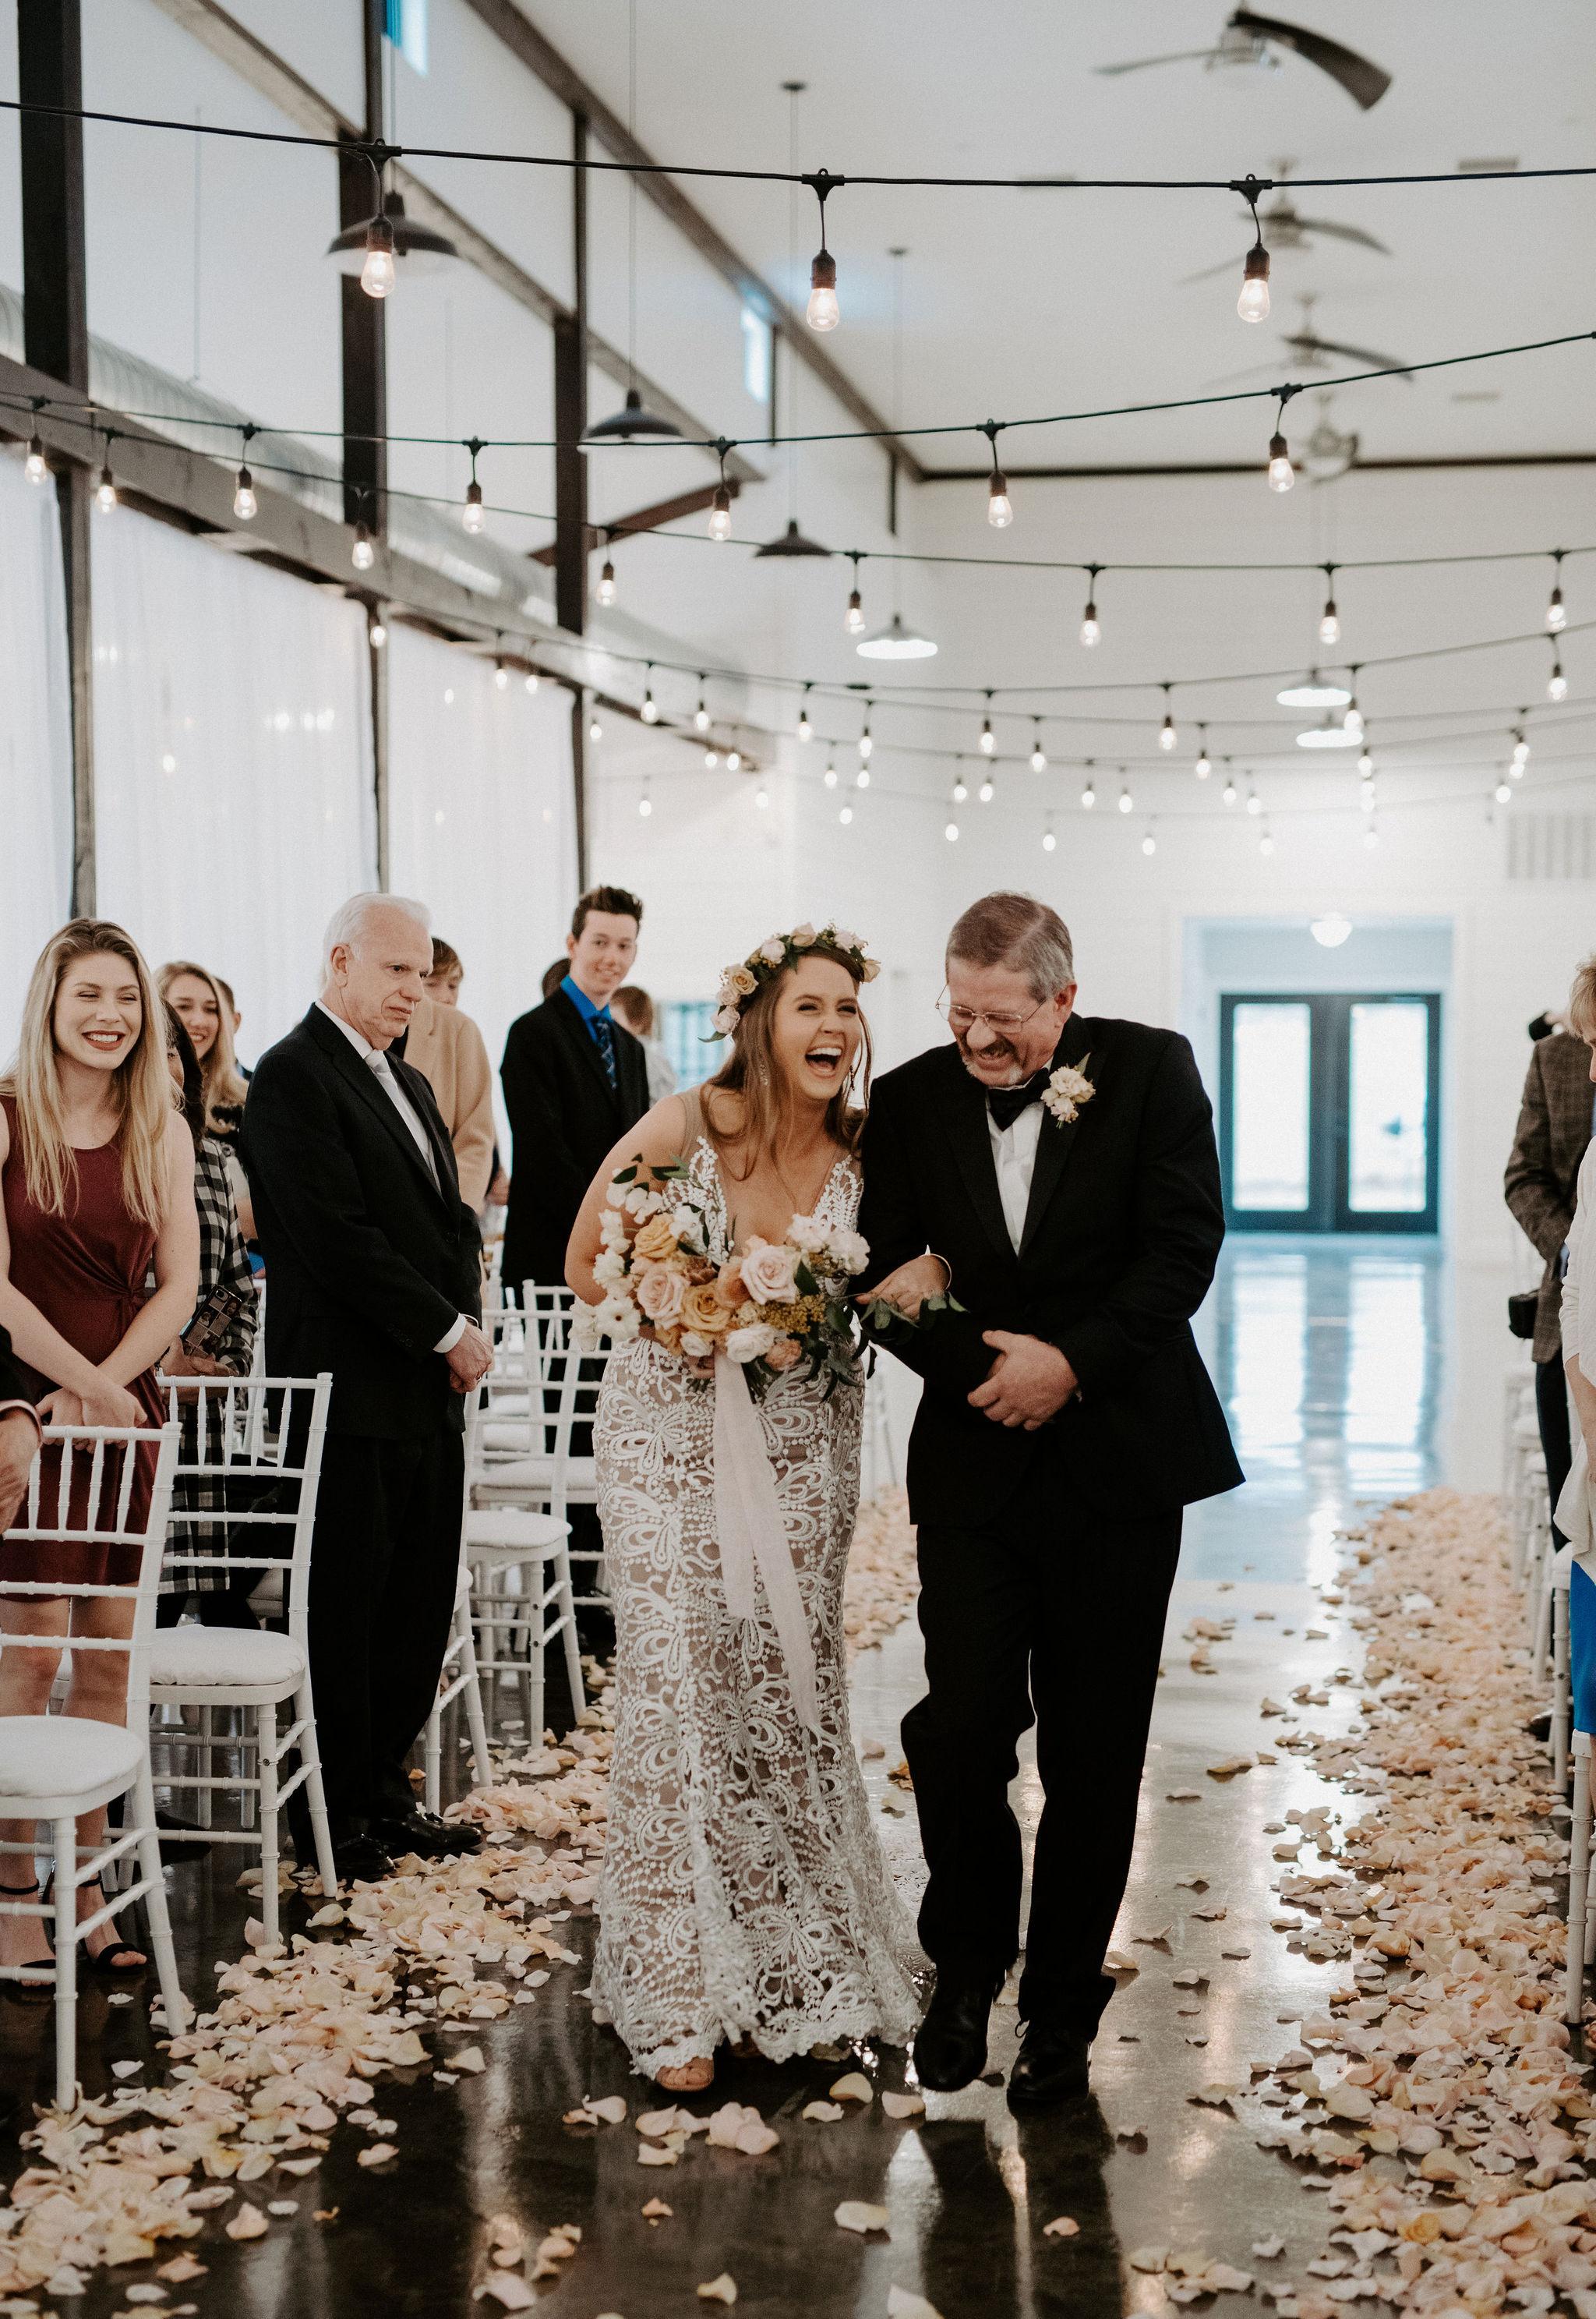 Tulsa Wedding Venue White Barn 25.jpg